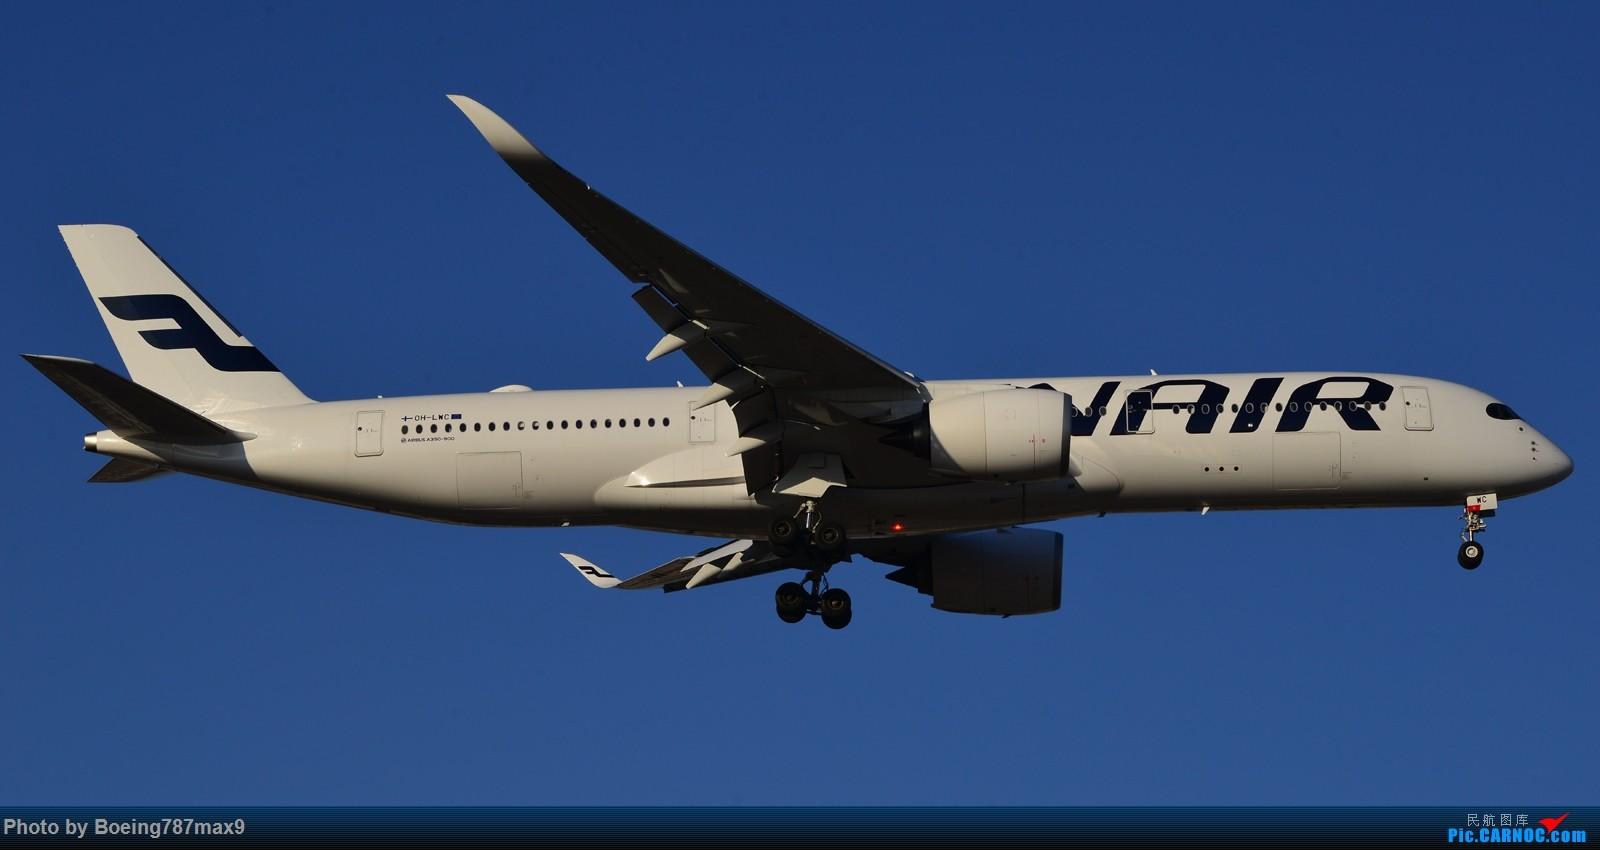 Re:[原创]【PEK】在芬航359停飞北京的前一天,去机场捕获350-900【1600高清大图】 AIRBUS A350-900 OH-LWC 中国北京首都国际机场